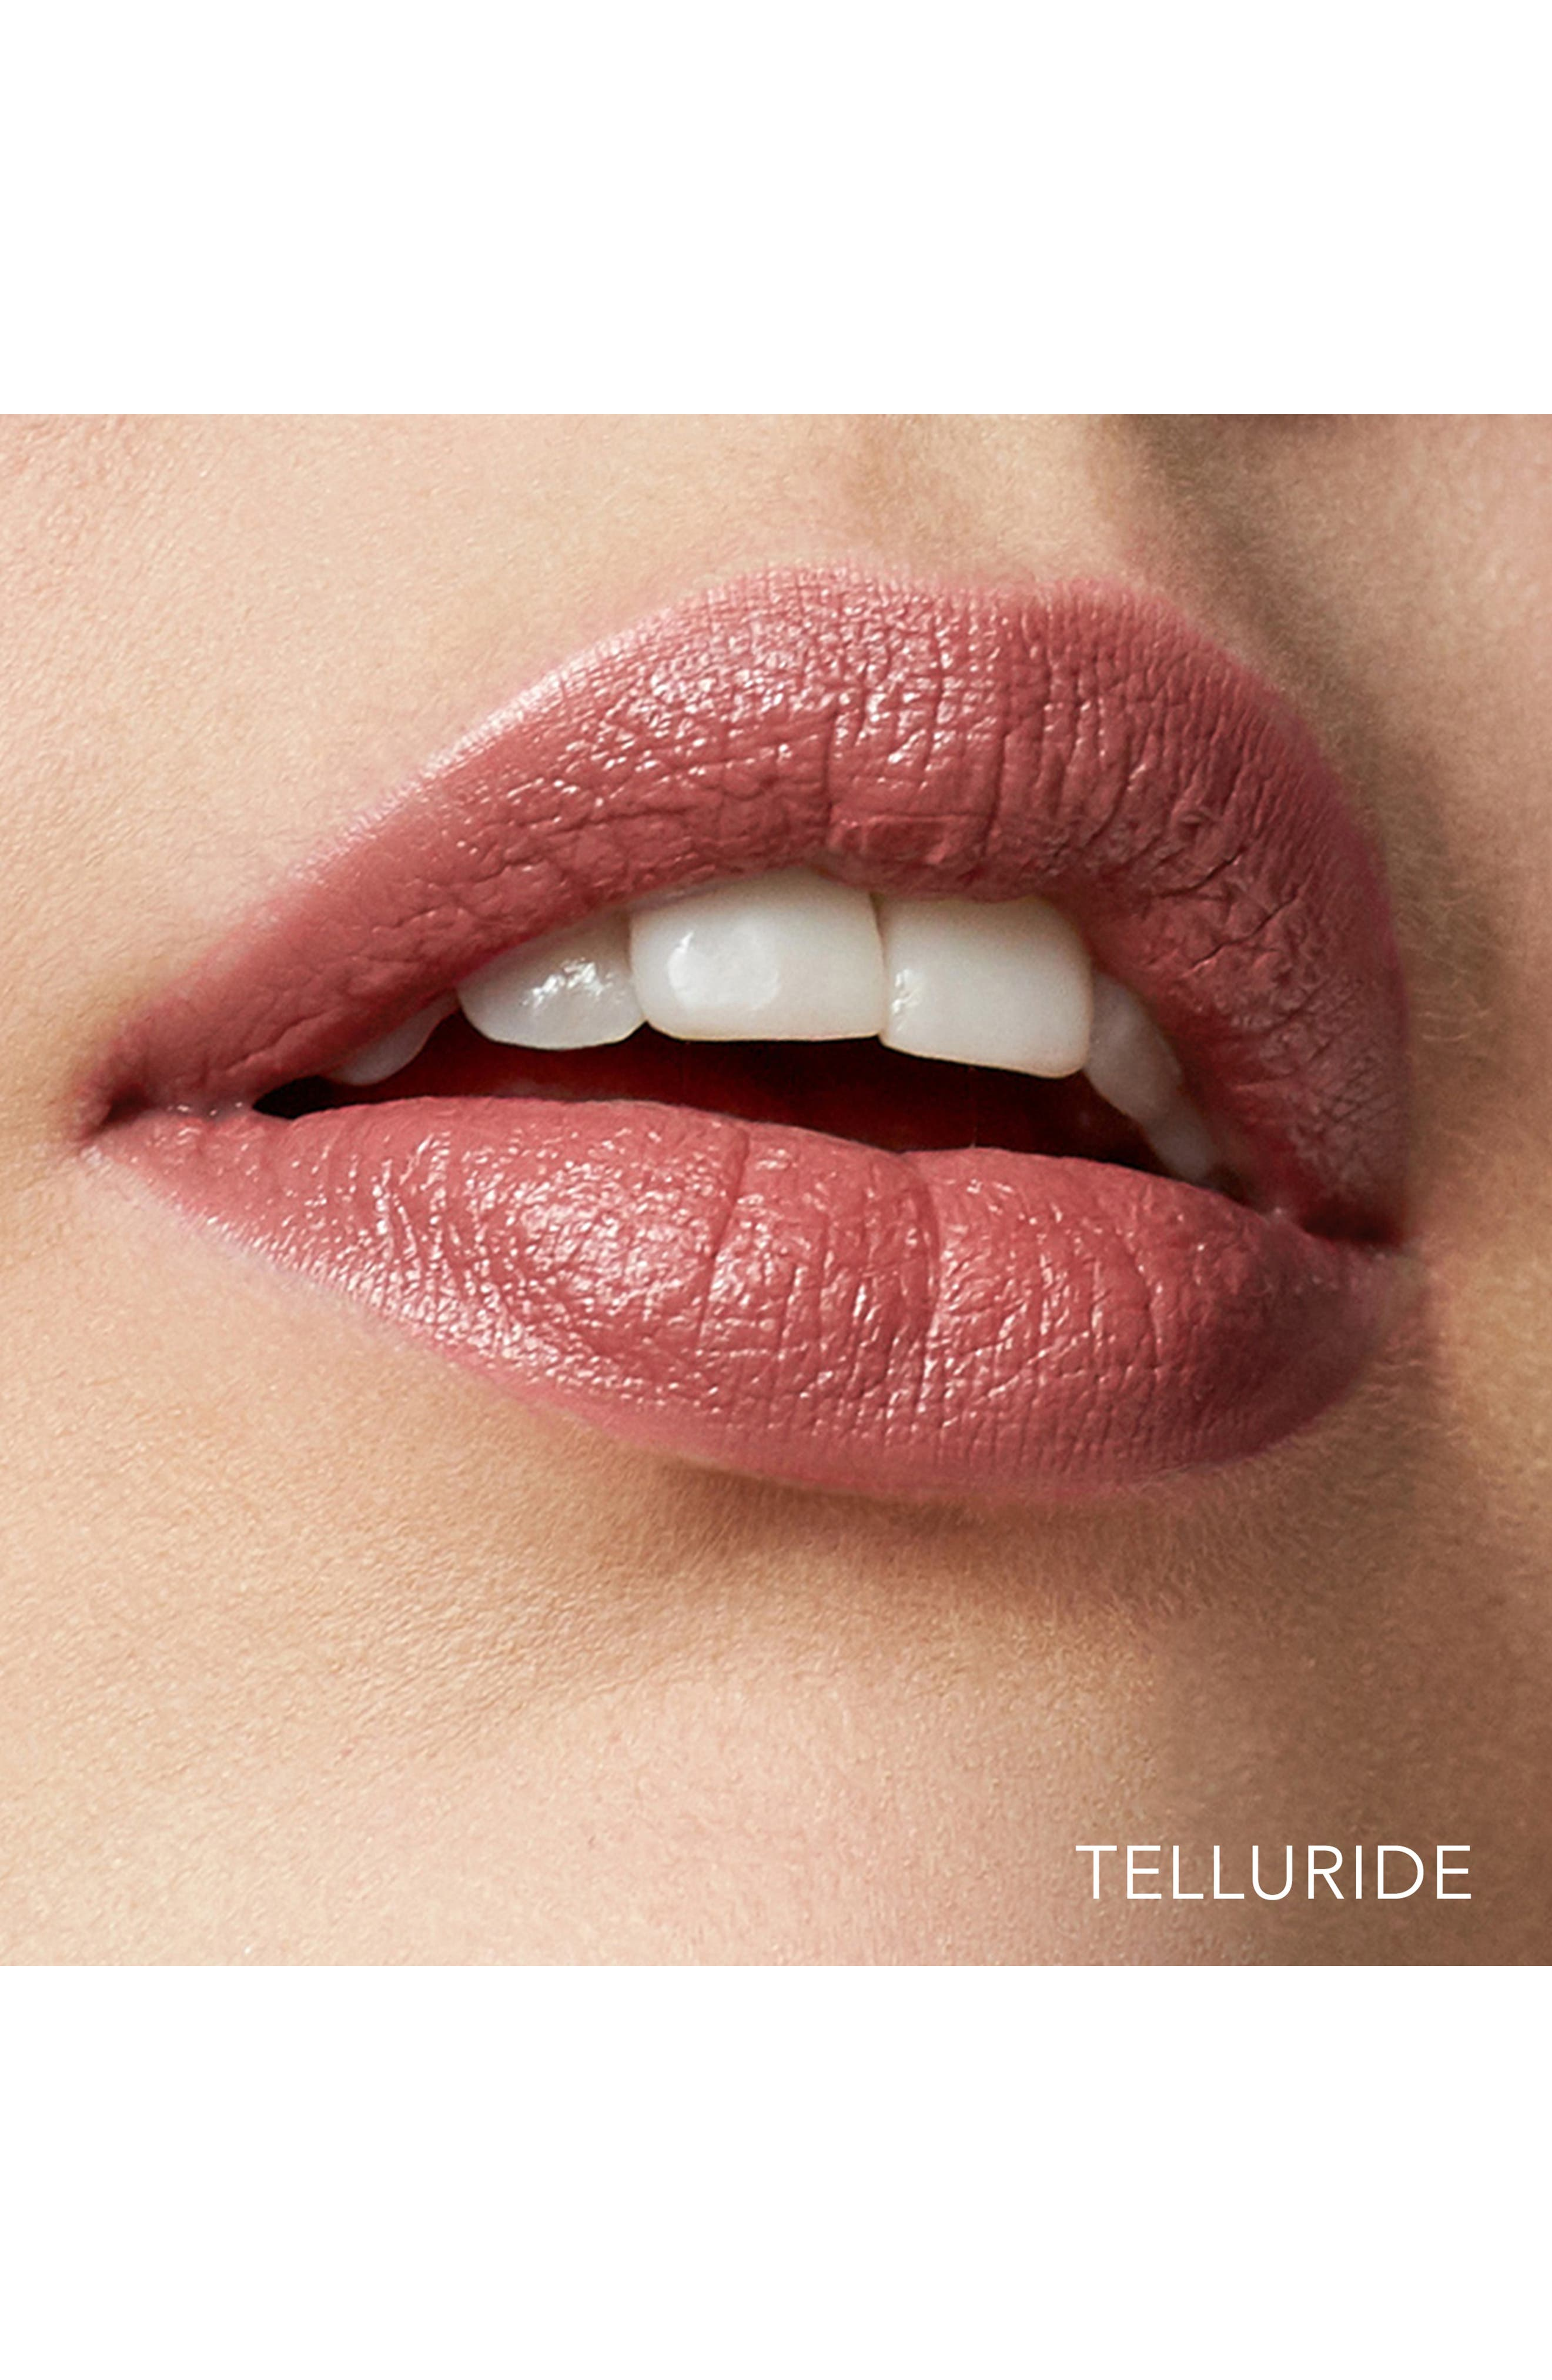 BOBBI BROWN,                             Crushed Lipstick,                             Alternate thumbnail 2, color,                             TELLURIDE / RED MAUVE